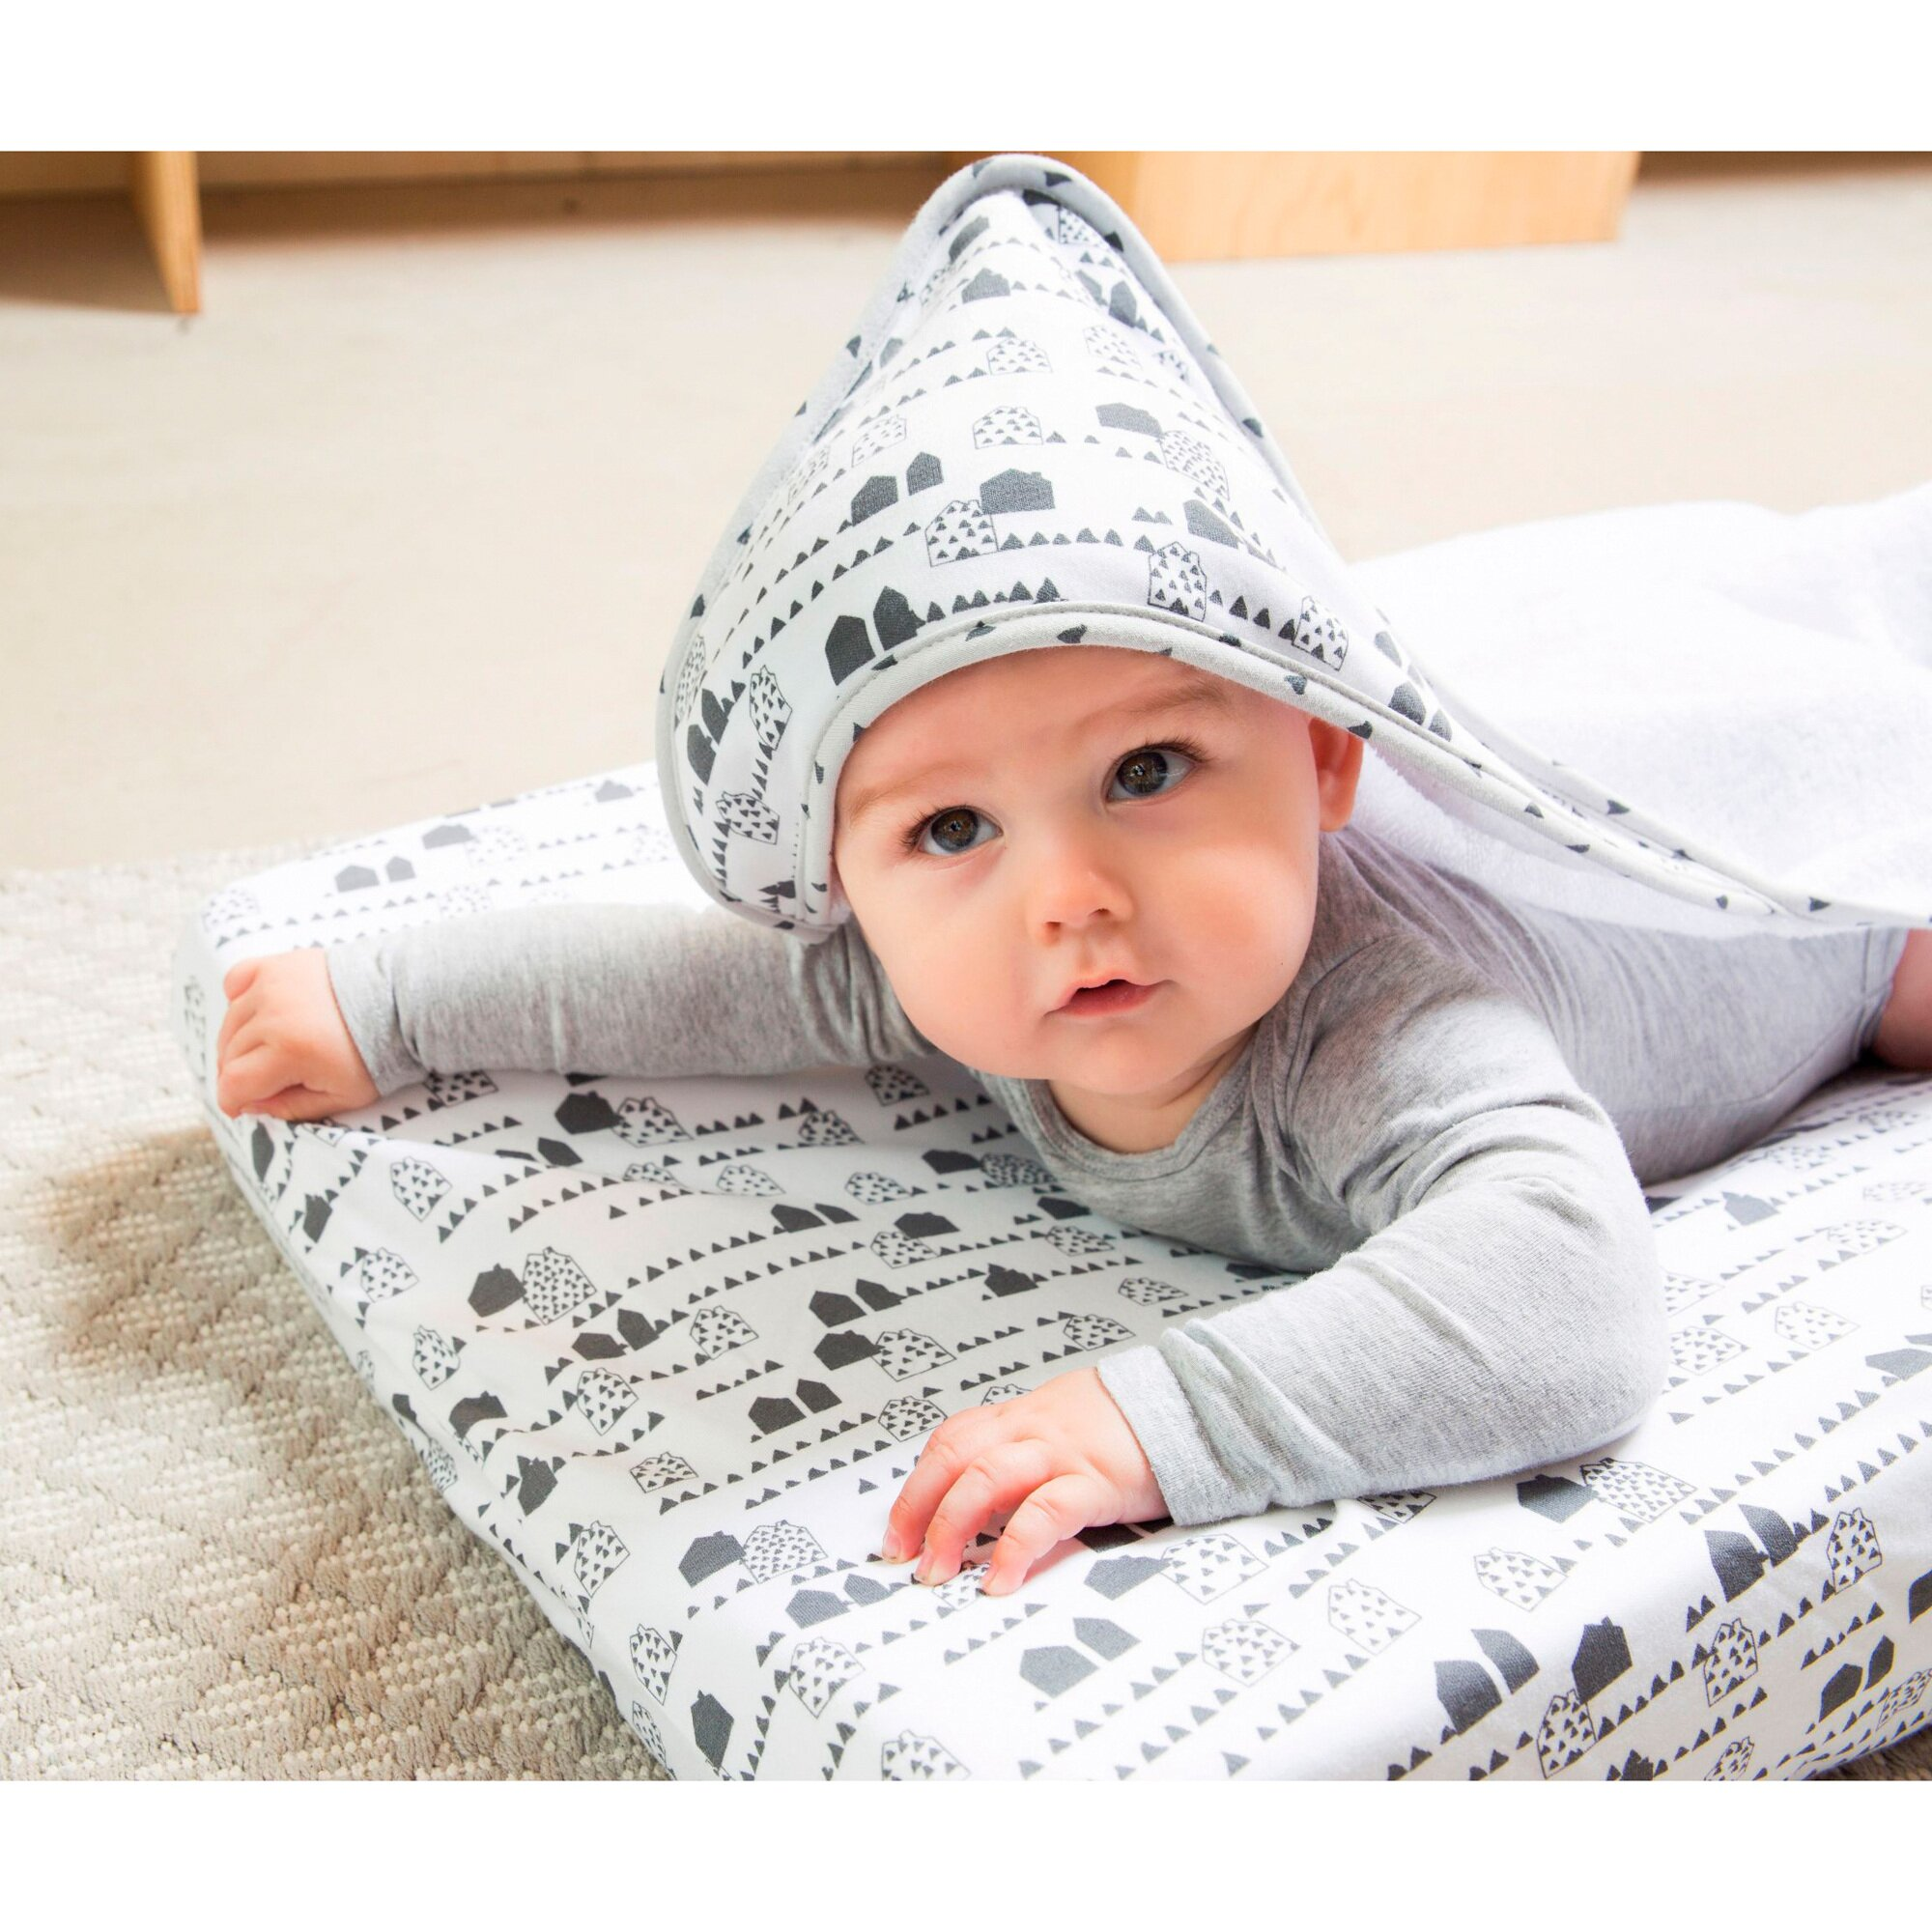 luma-babycare-kapuzen-badetuch-85x75-cm-grau